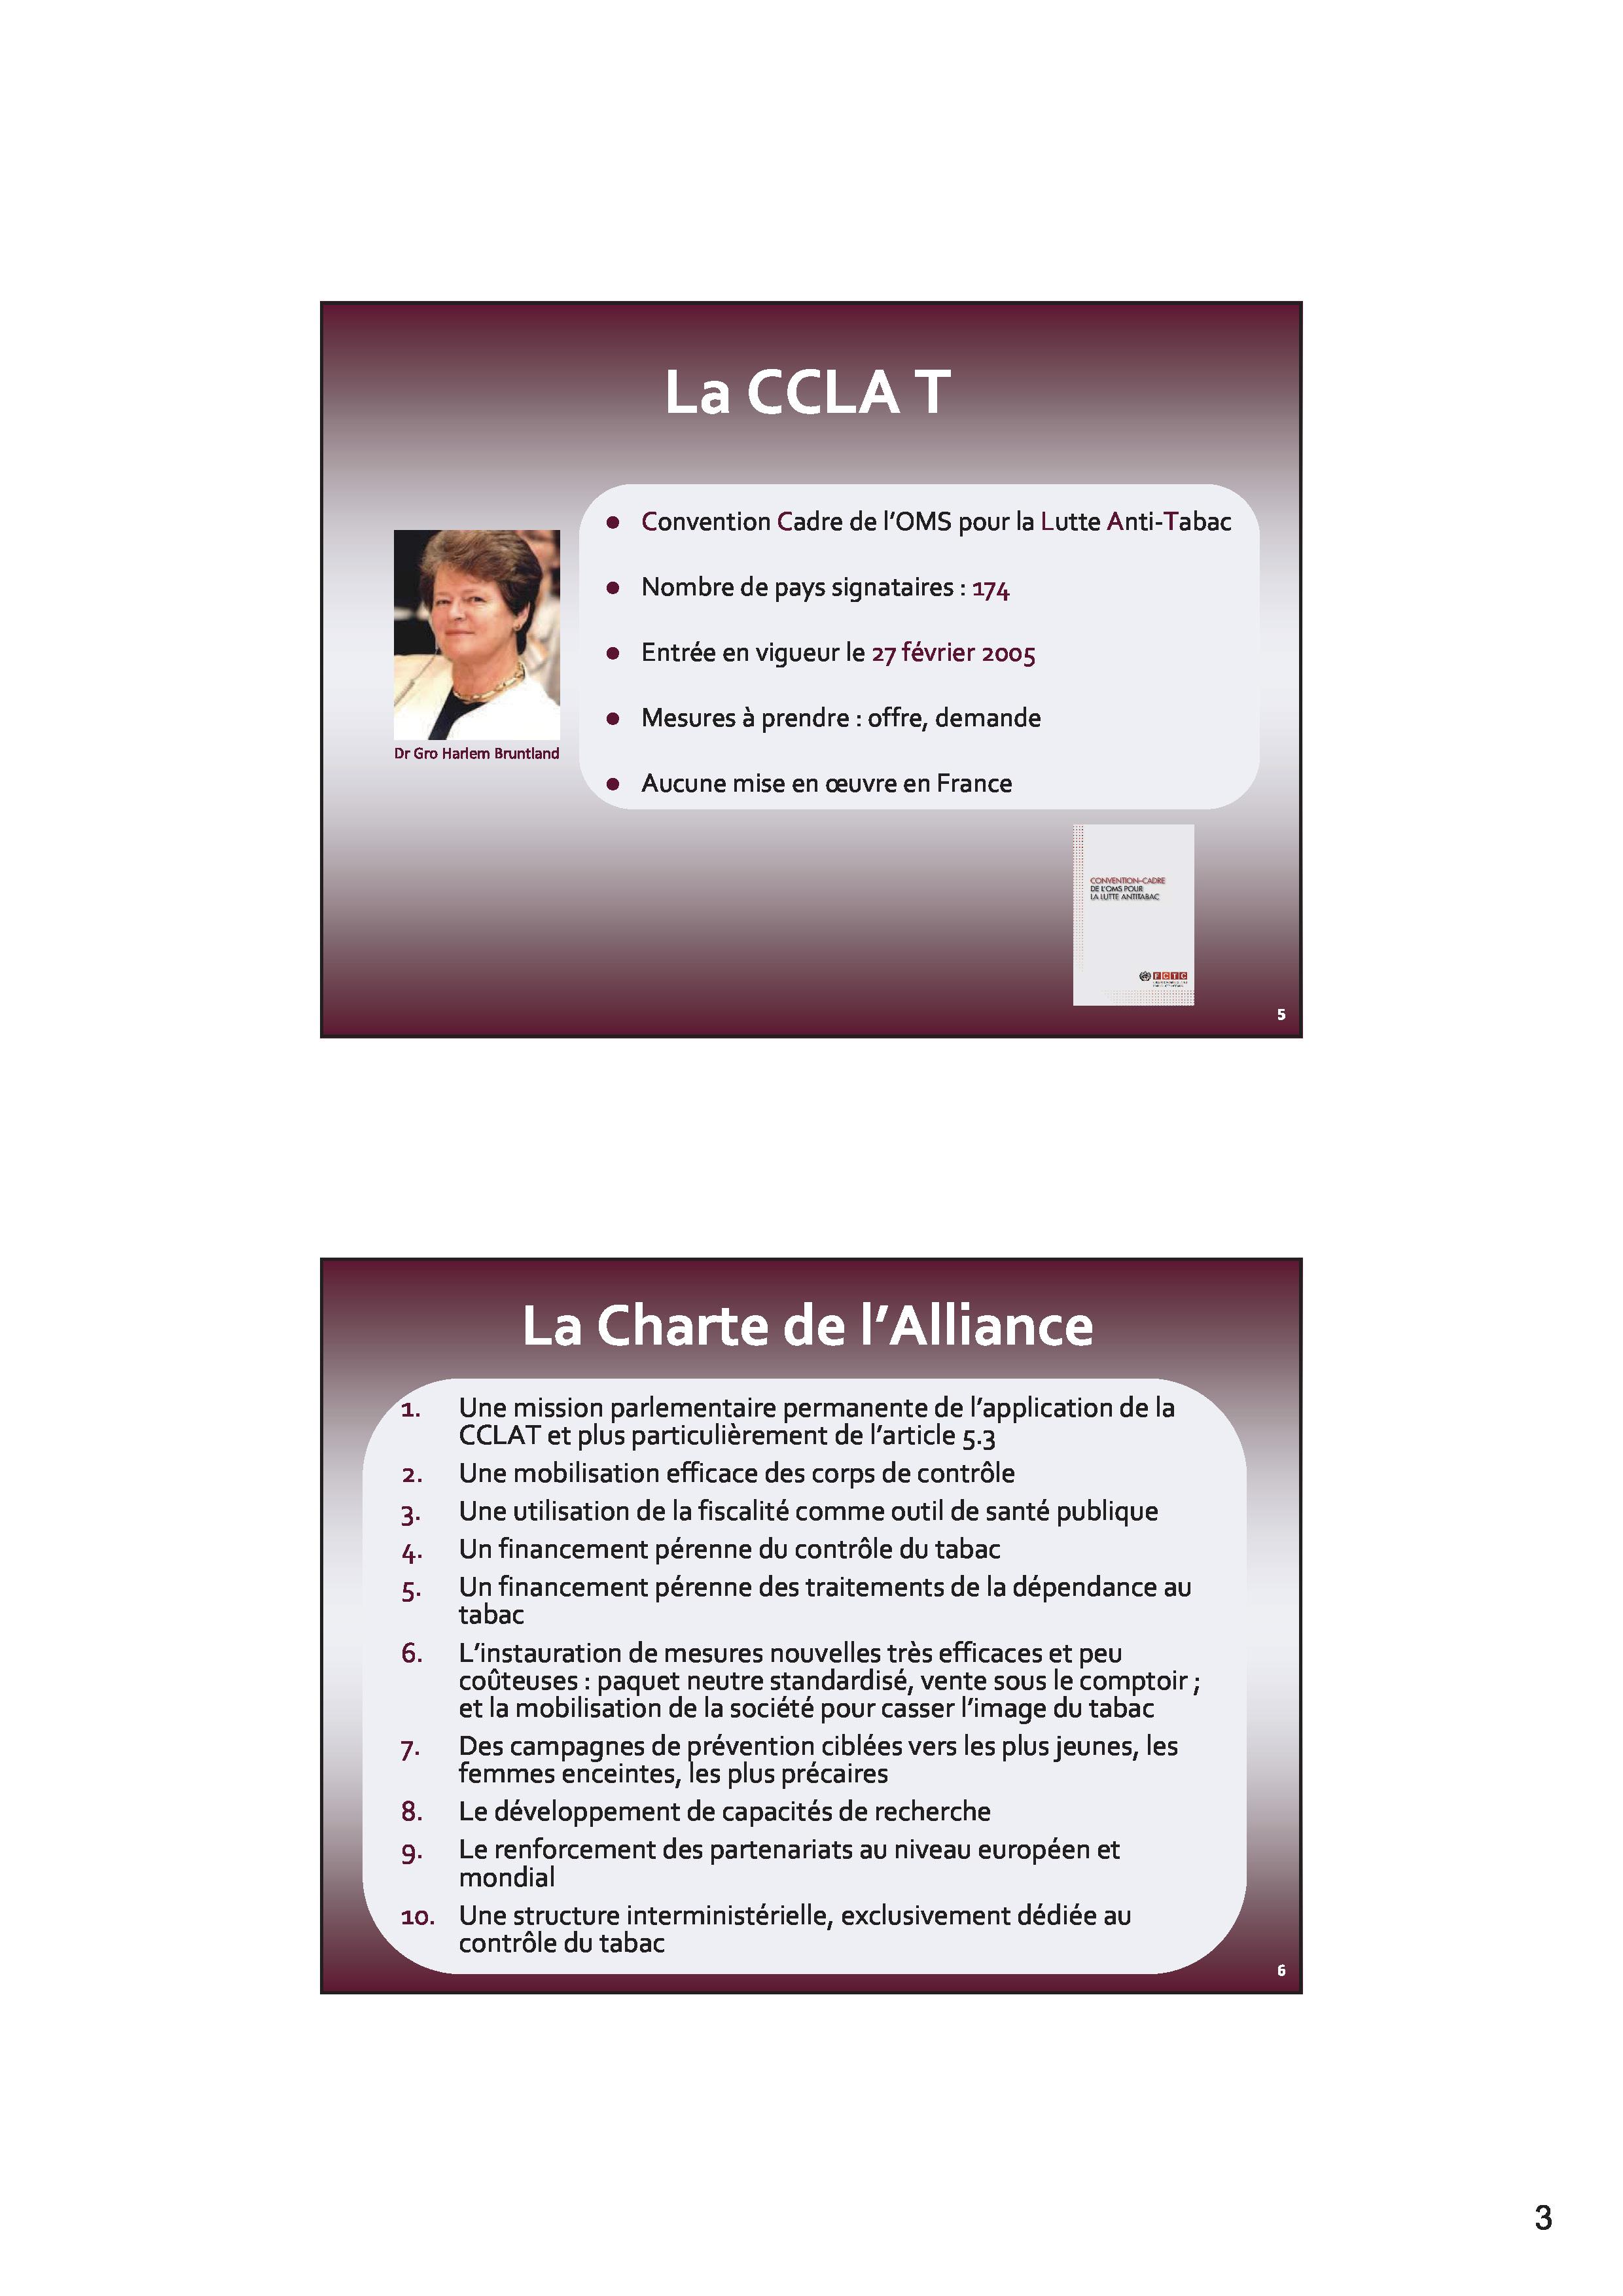 Alliance-dossier-presse-livre-blanc-11avr2012_Page_08.jpg